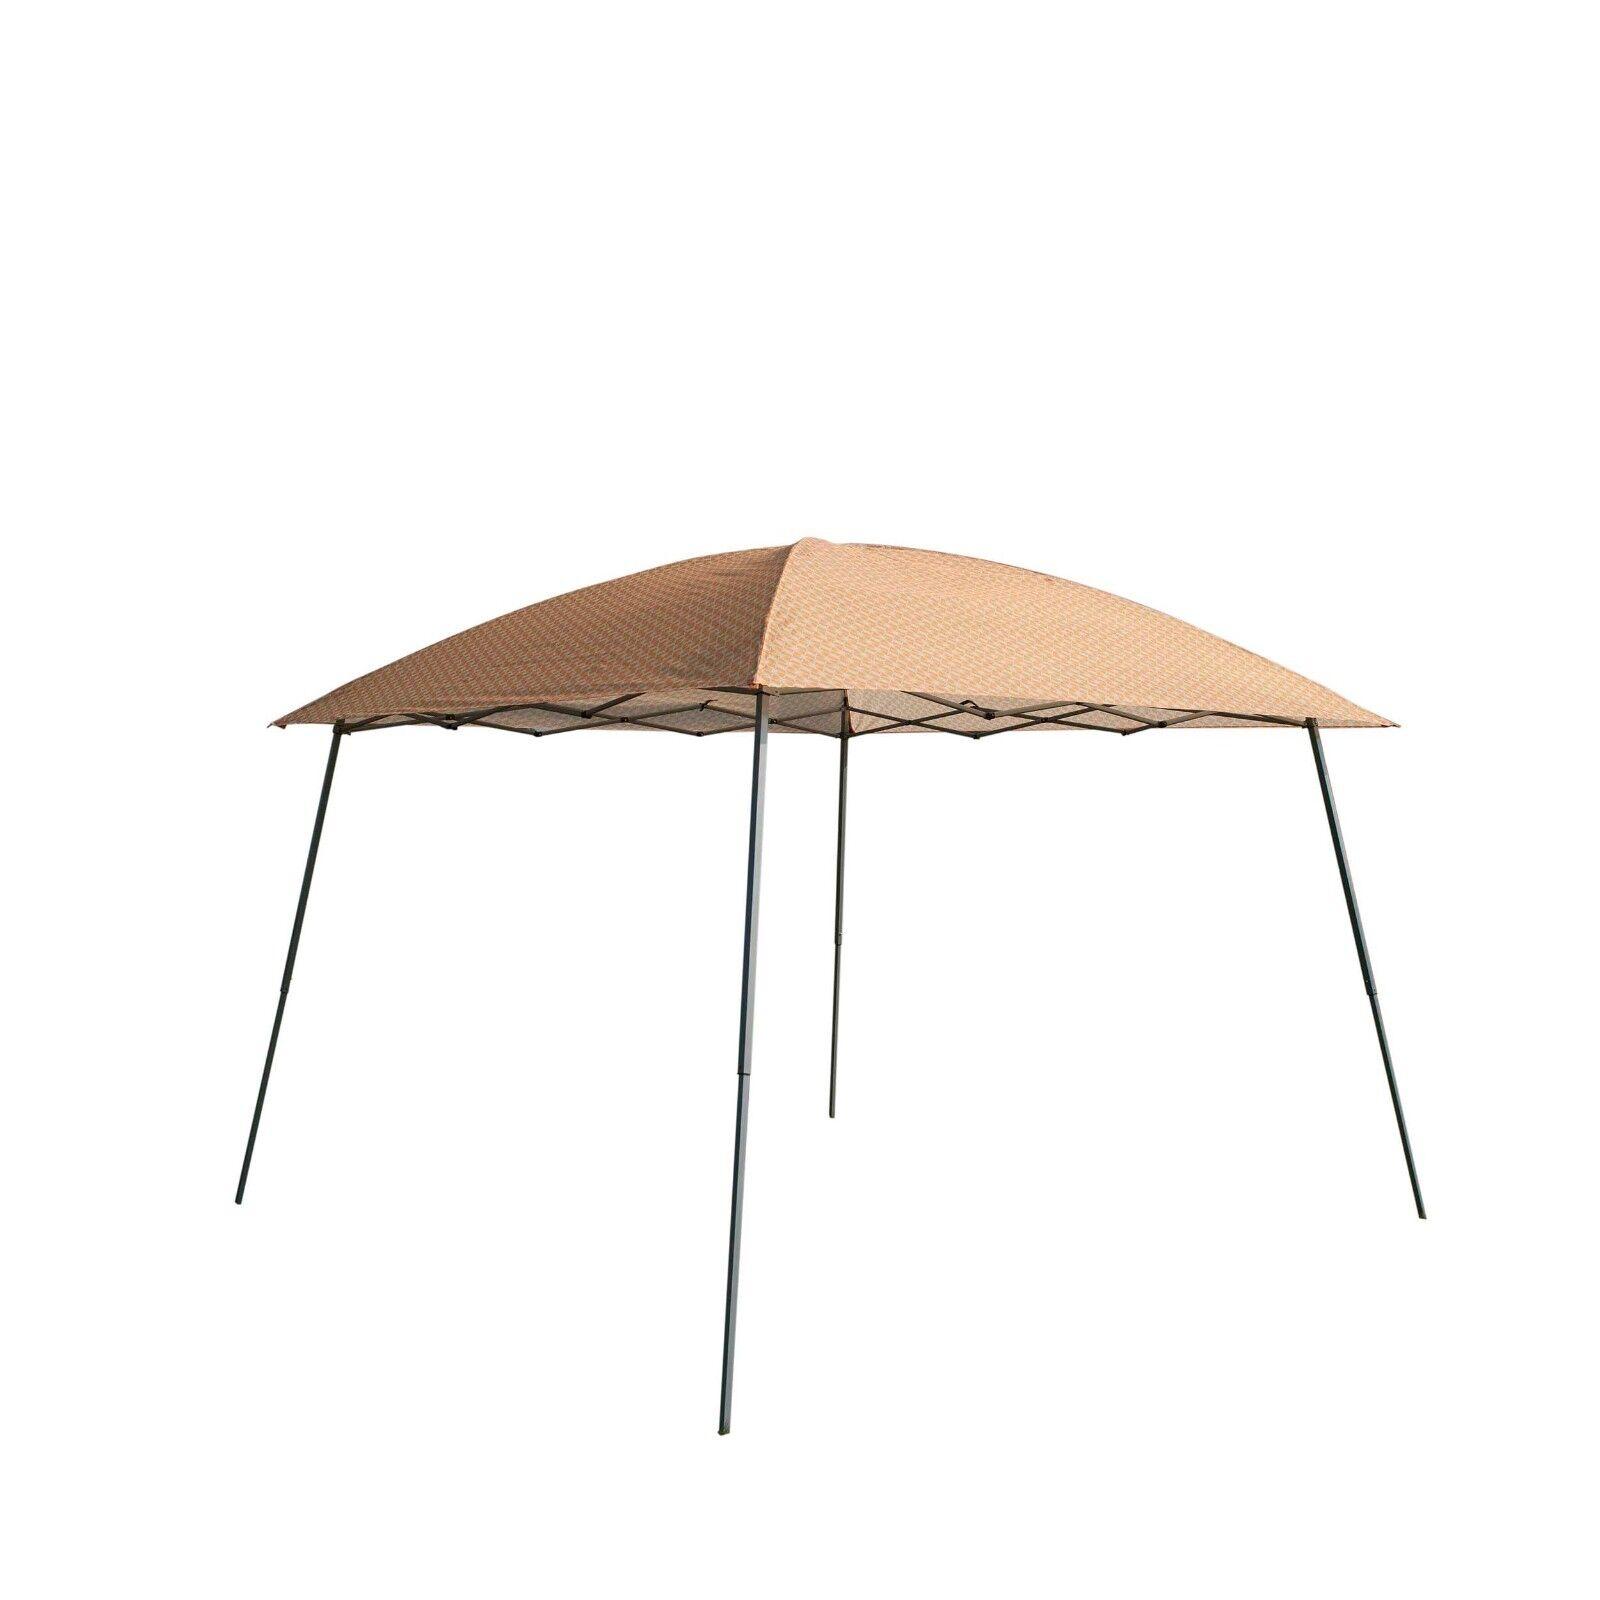 EZ Pop-Up Canopy 10'x10' Party Tent Outdoor Garden Sun Shade